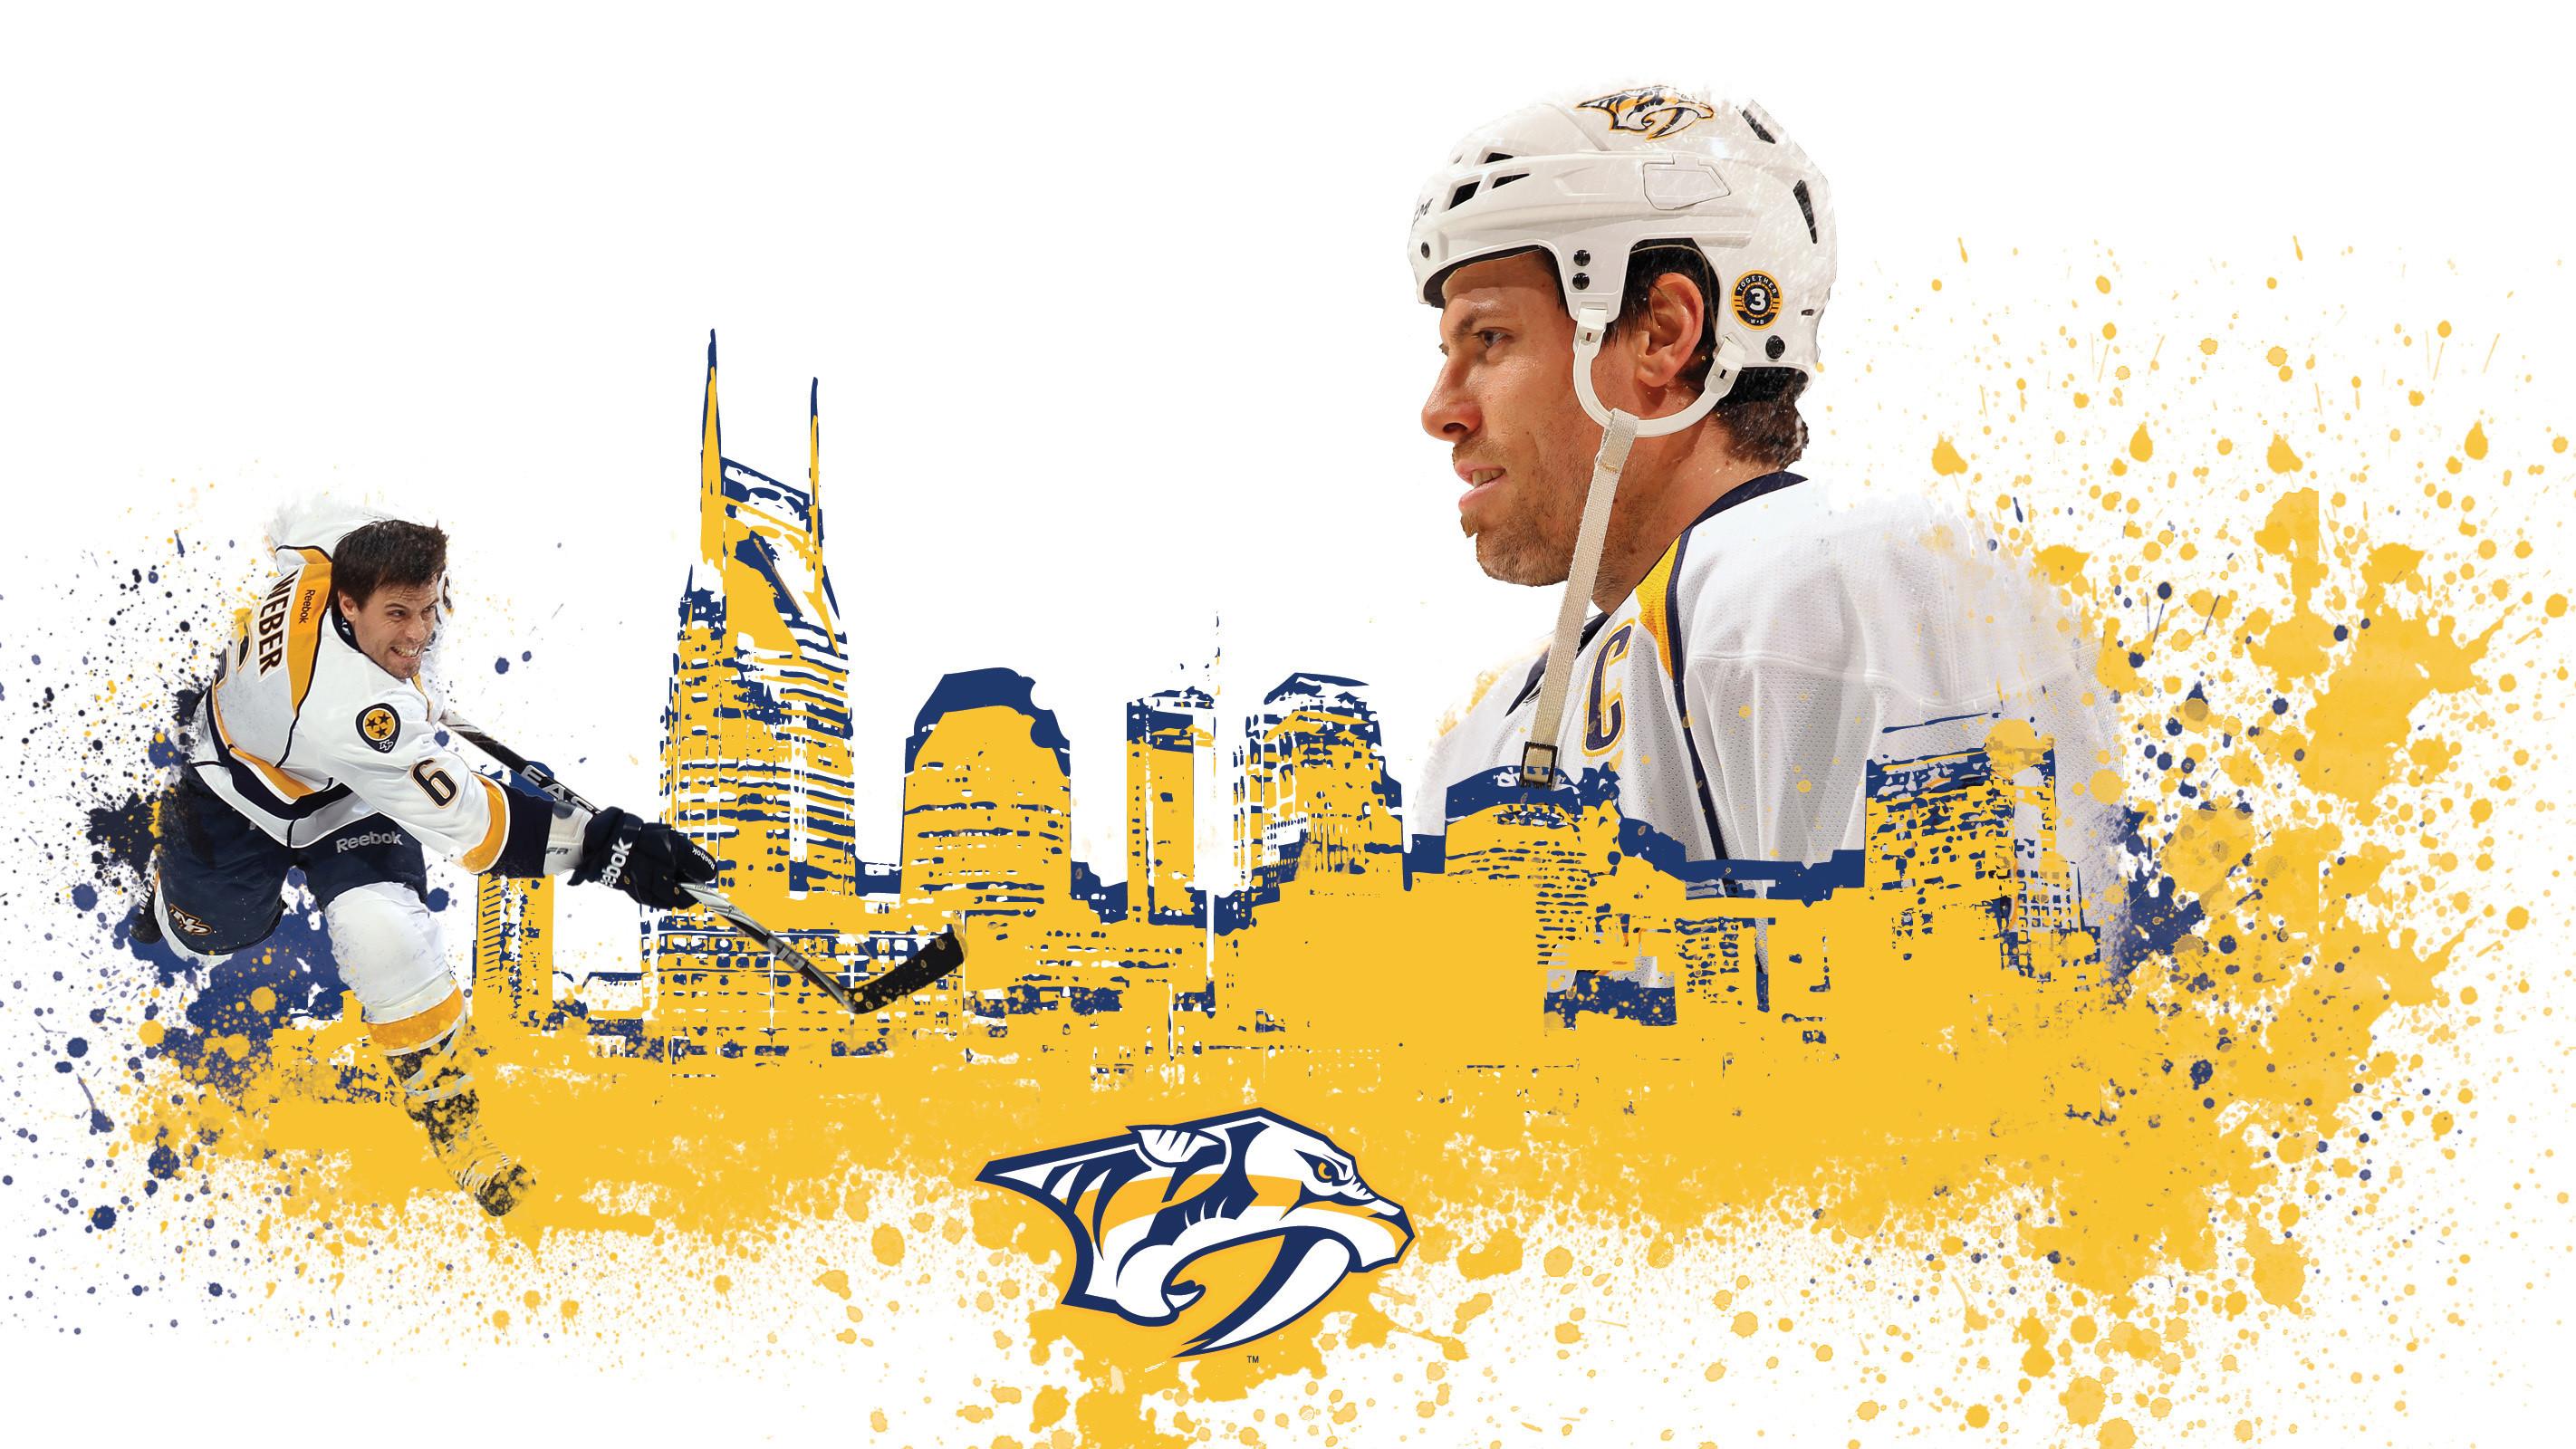 NHL player SHEA Weber